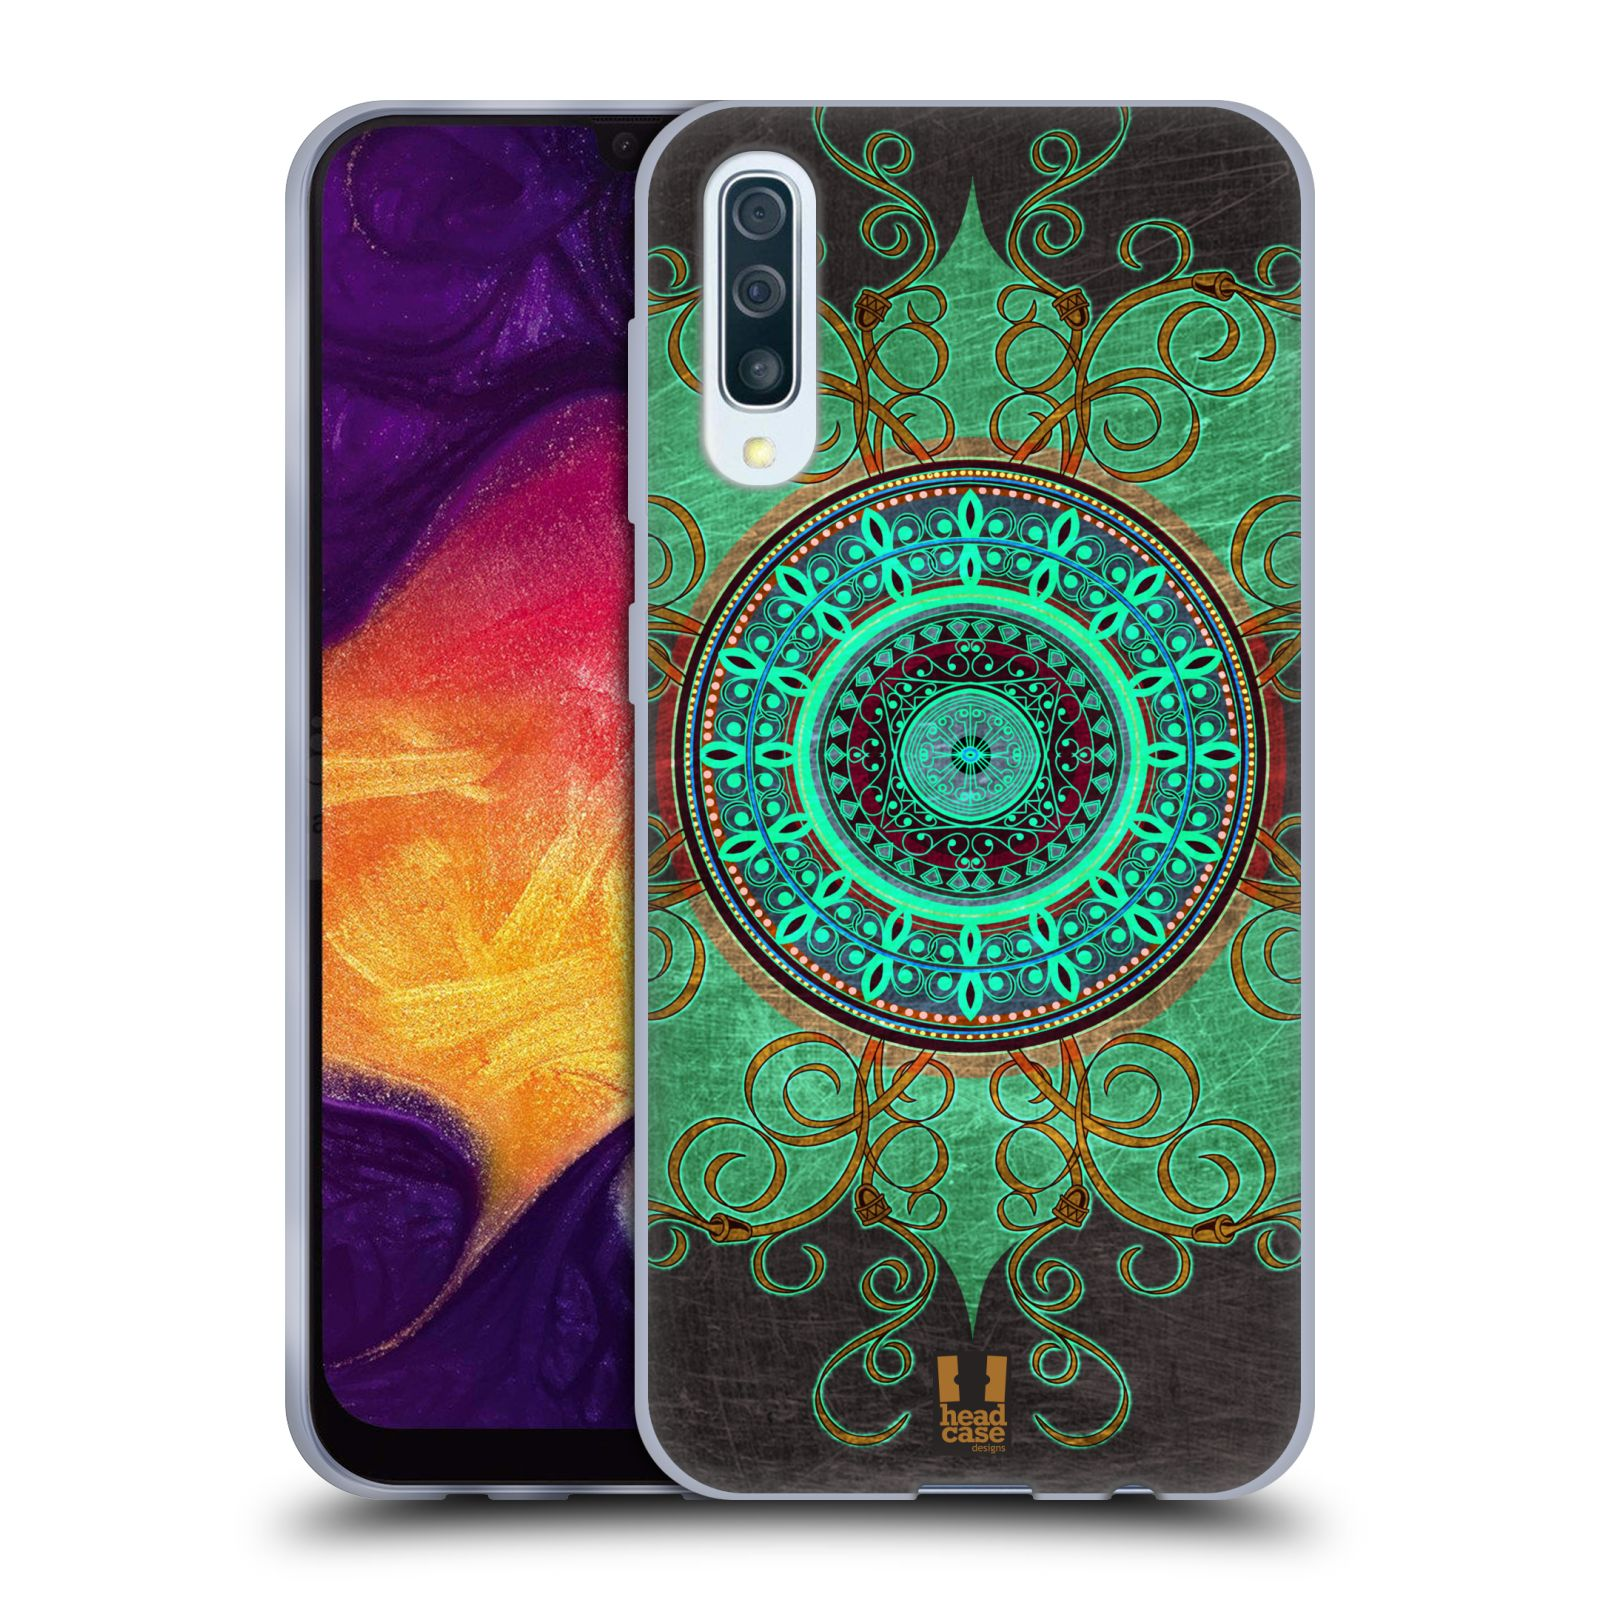 Silikonové pouzdro na mobil Samsung Galaxy A50 / A30s - Head Case - ARAB MANDALA